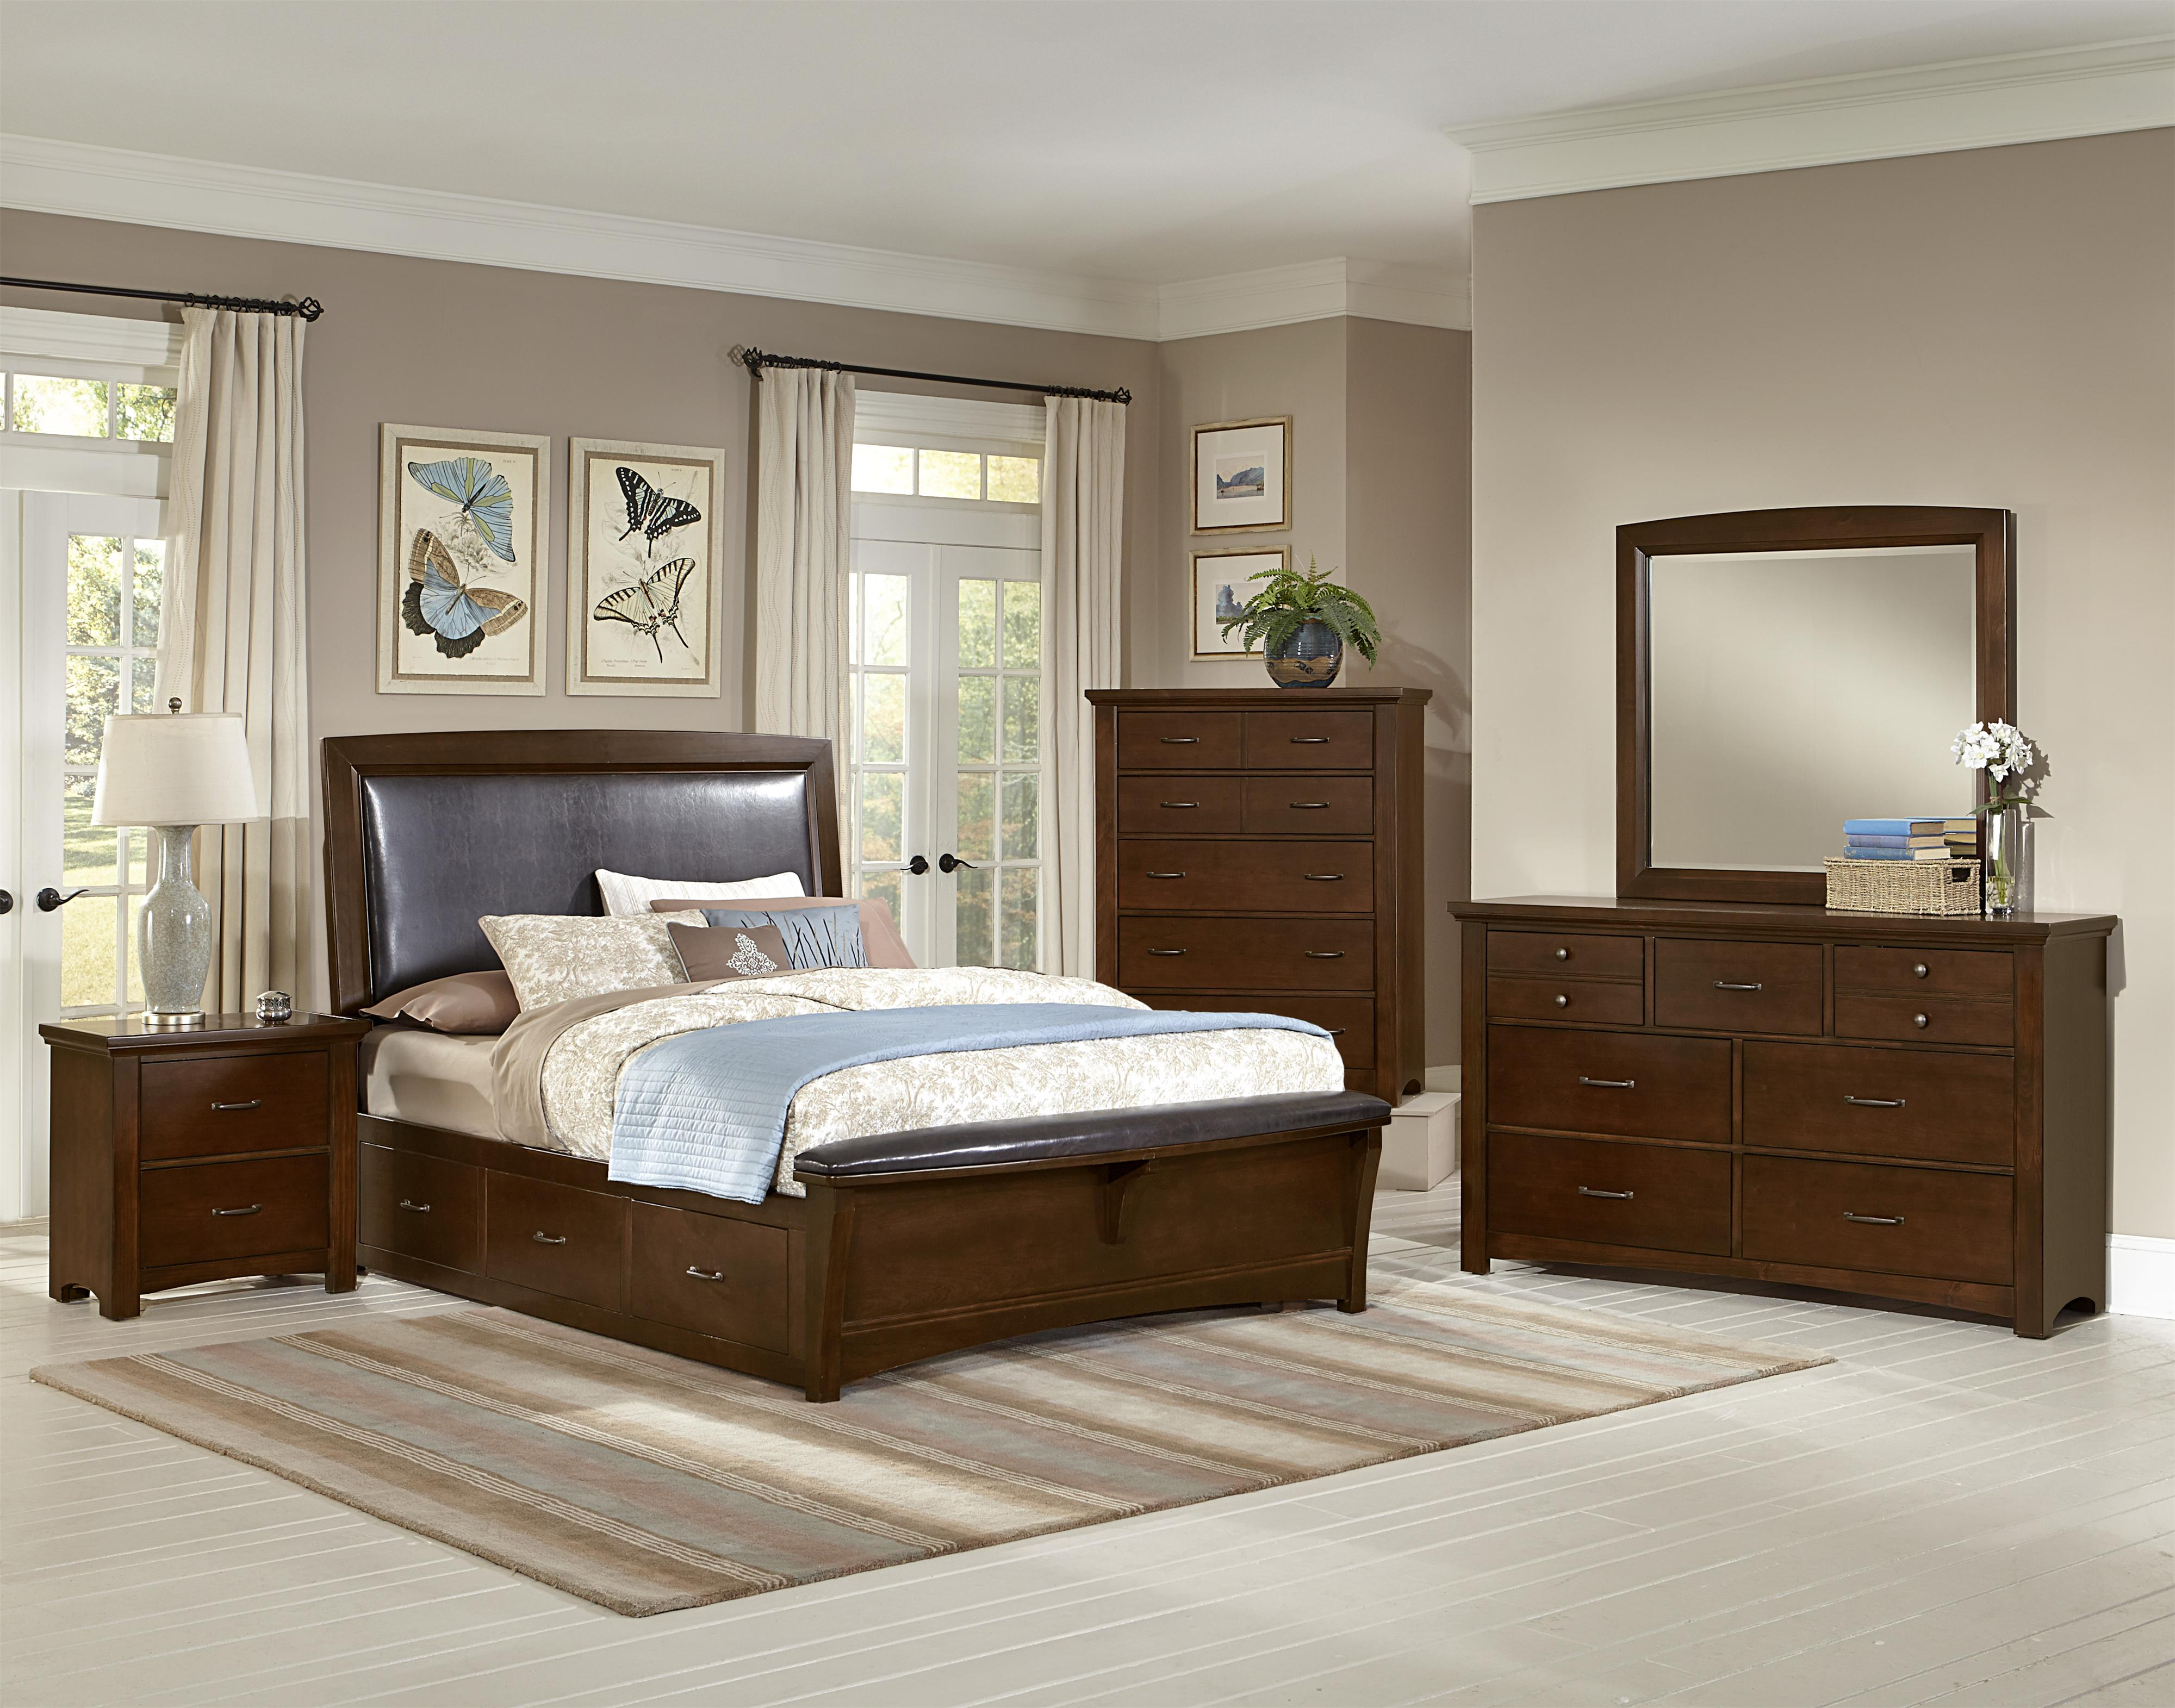 Vaughan Bassett Transitions Queen Bedroom Group Olinde s